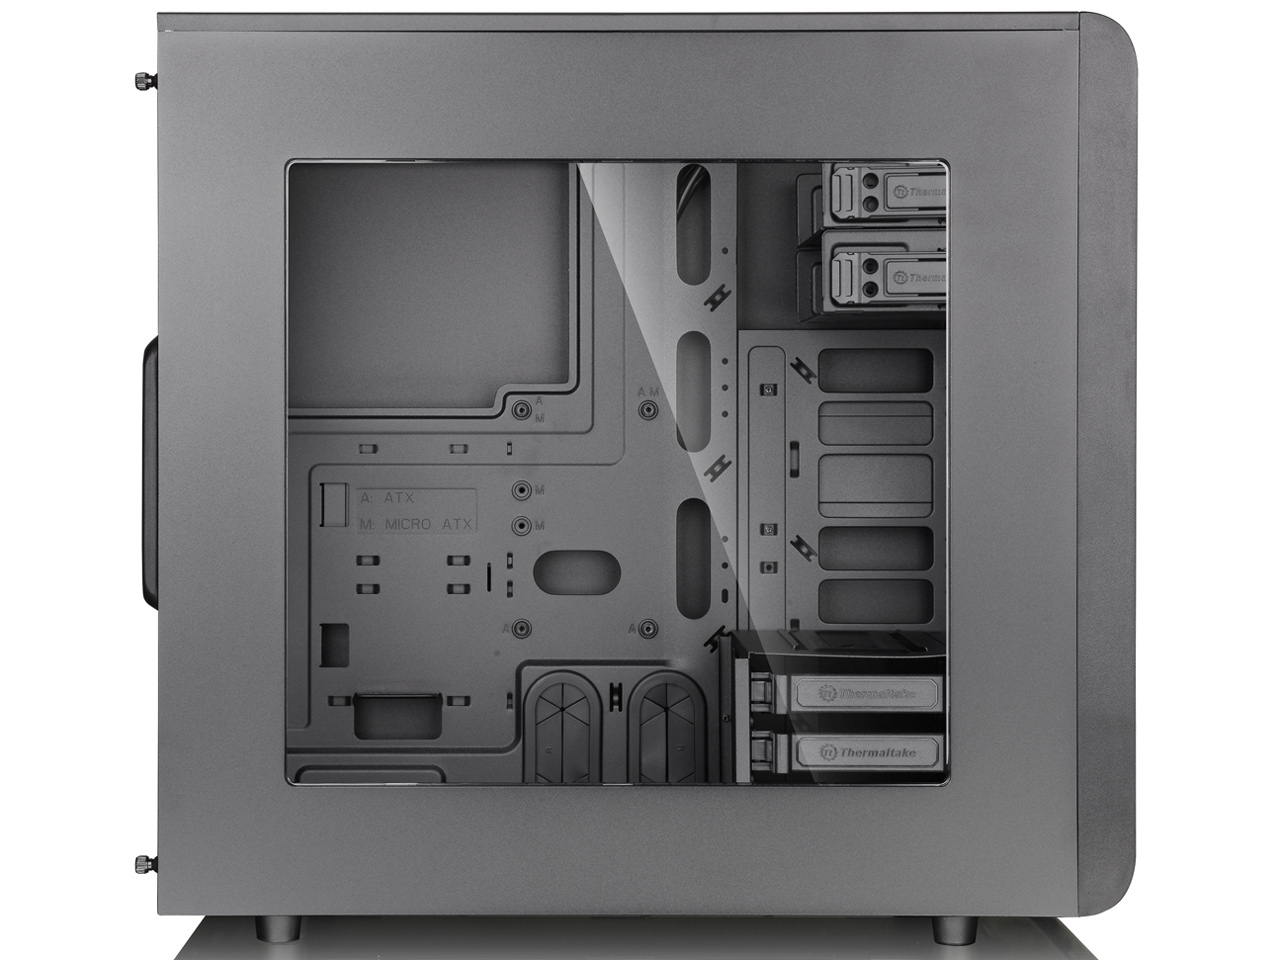 『本体 左側面』 Core V31 CA-1C8-00M1WN-00 の製品画像